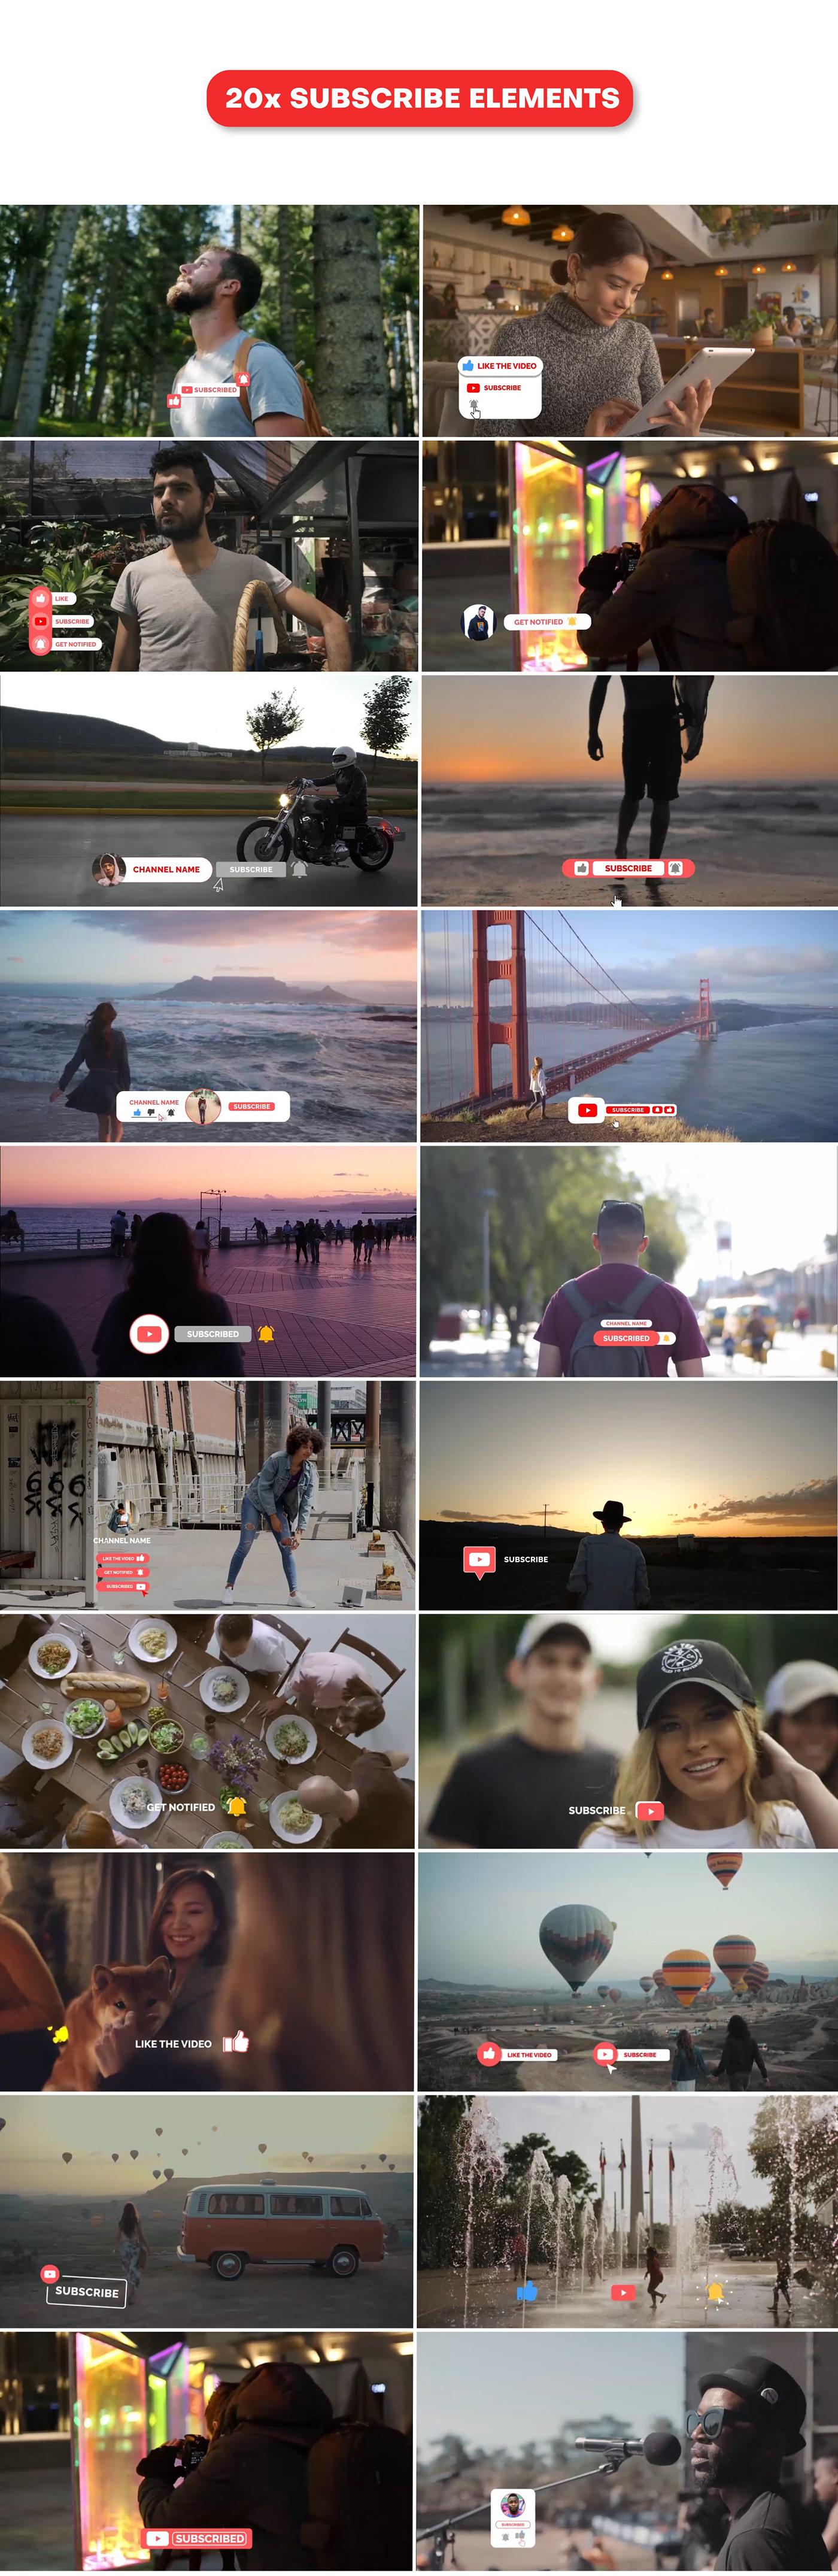 YouTube Promo Pack - 8